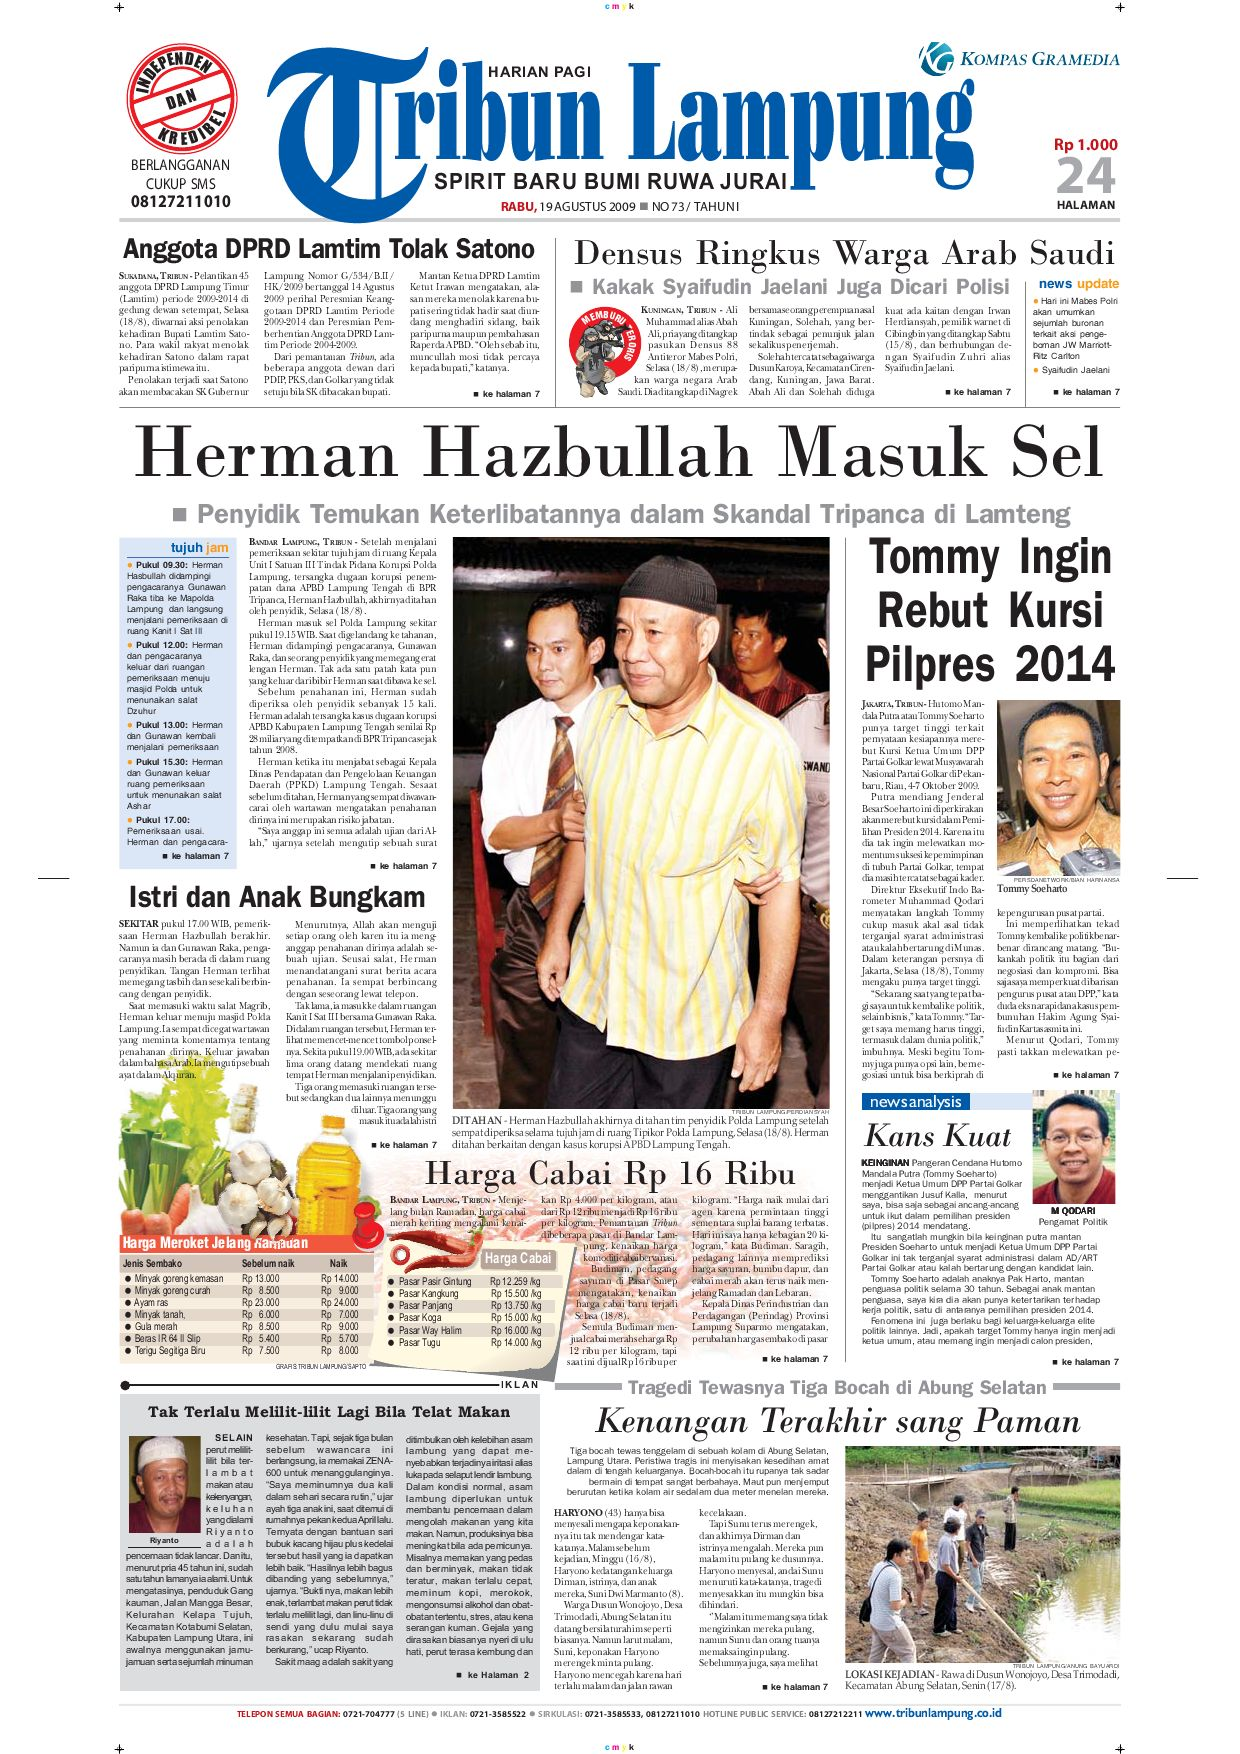 Tribun Lampung 19 Agustus 2009 By Issuu Parcel Makanan Pja 1606